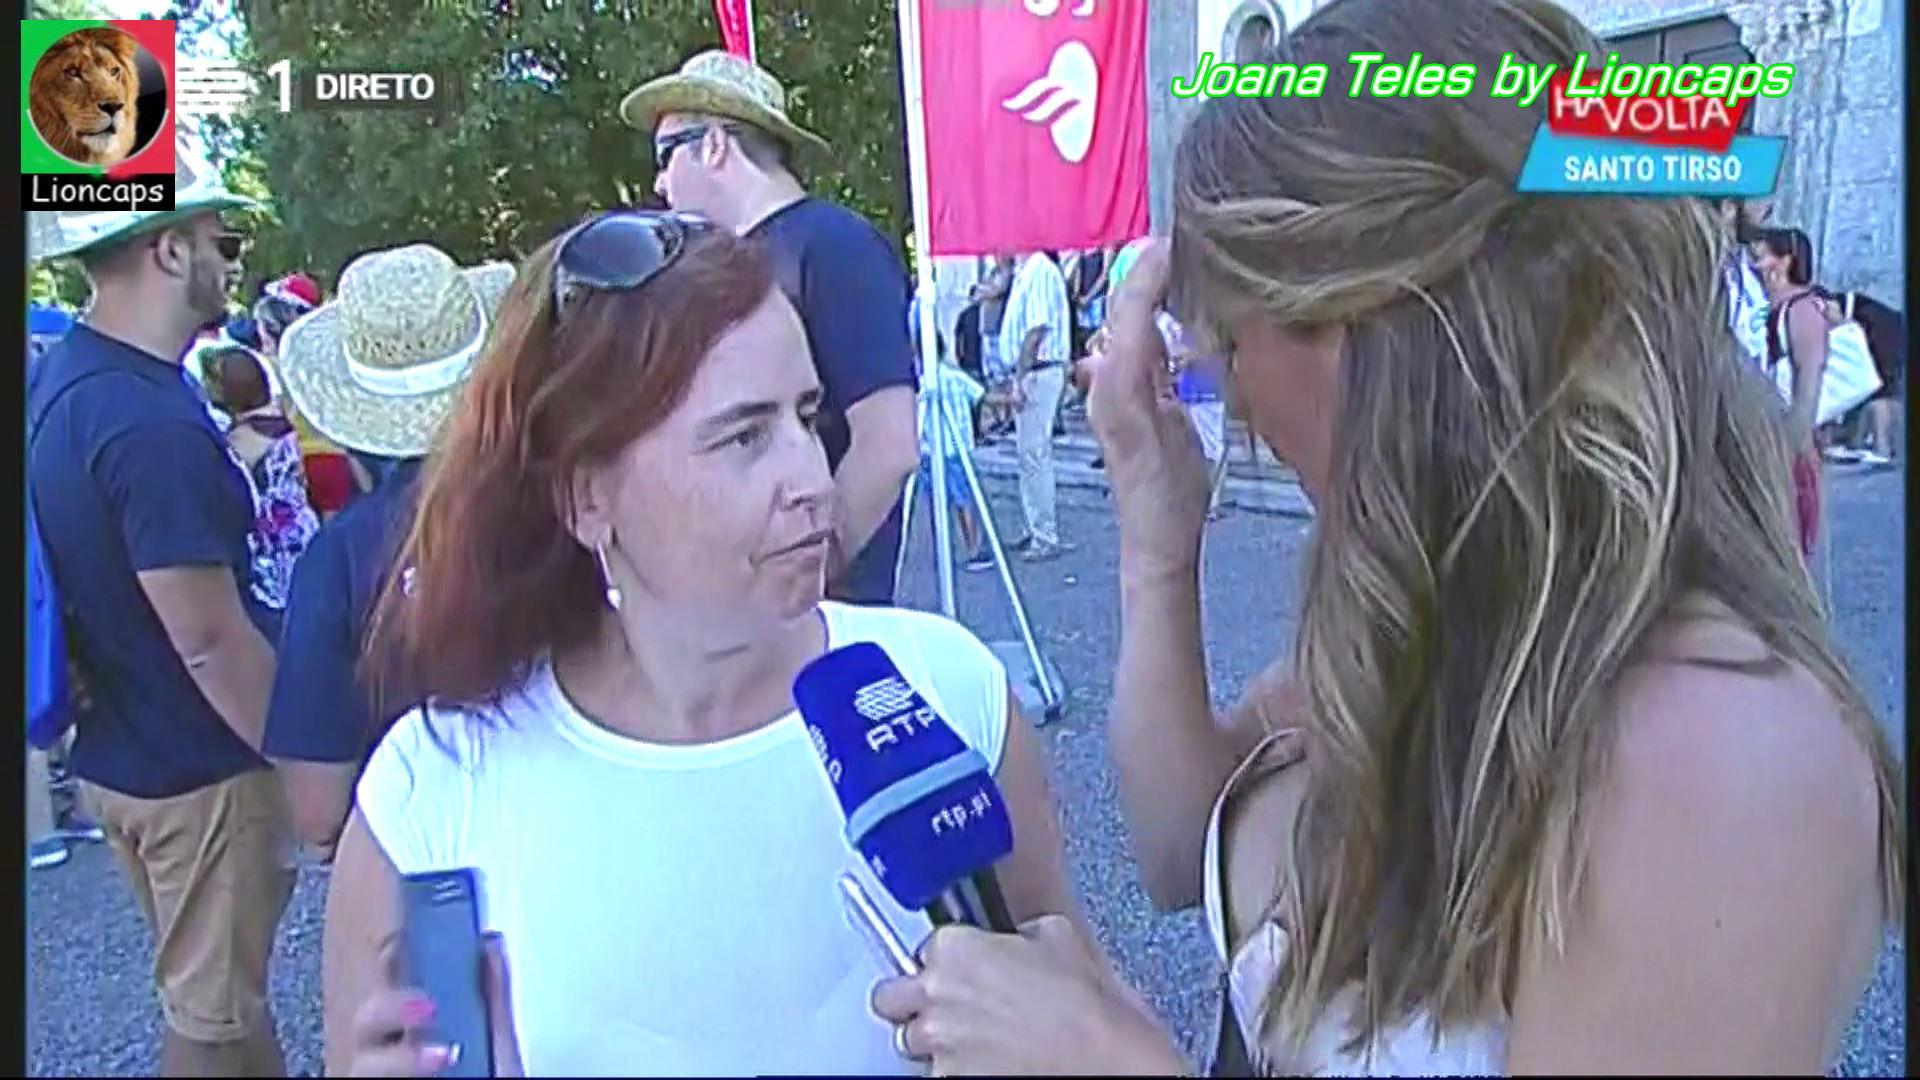 320102503_joana_teles_vs170822_0093_122_548lo.JPG